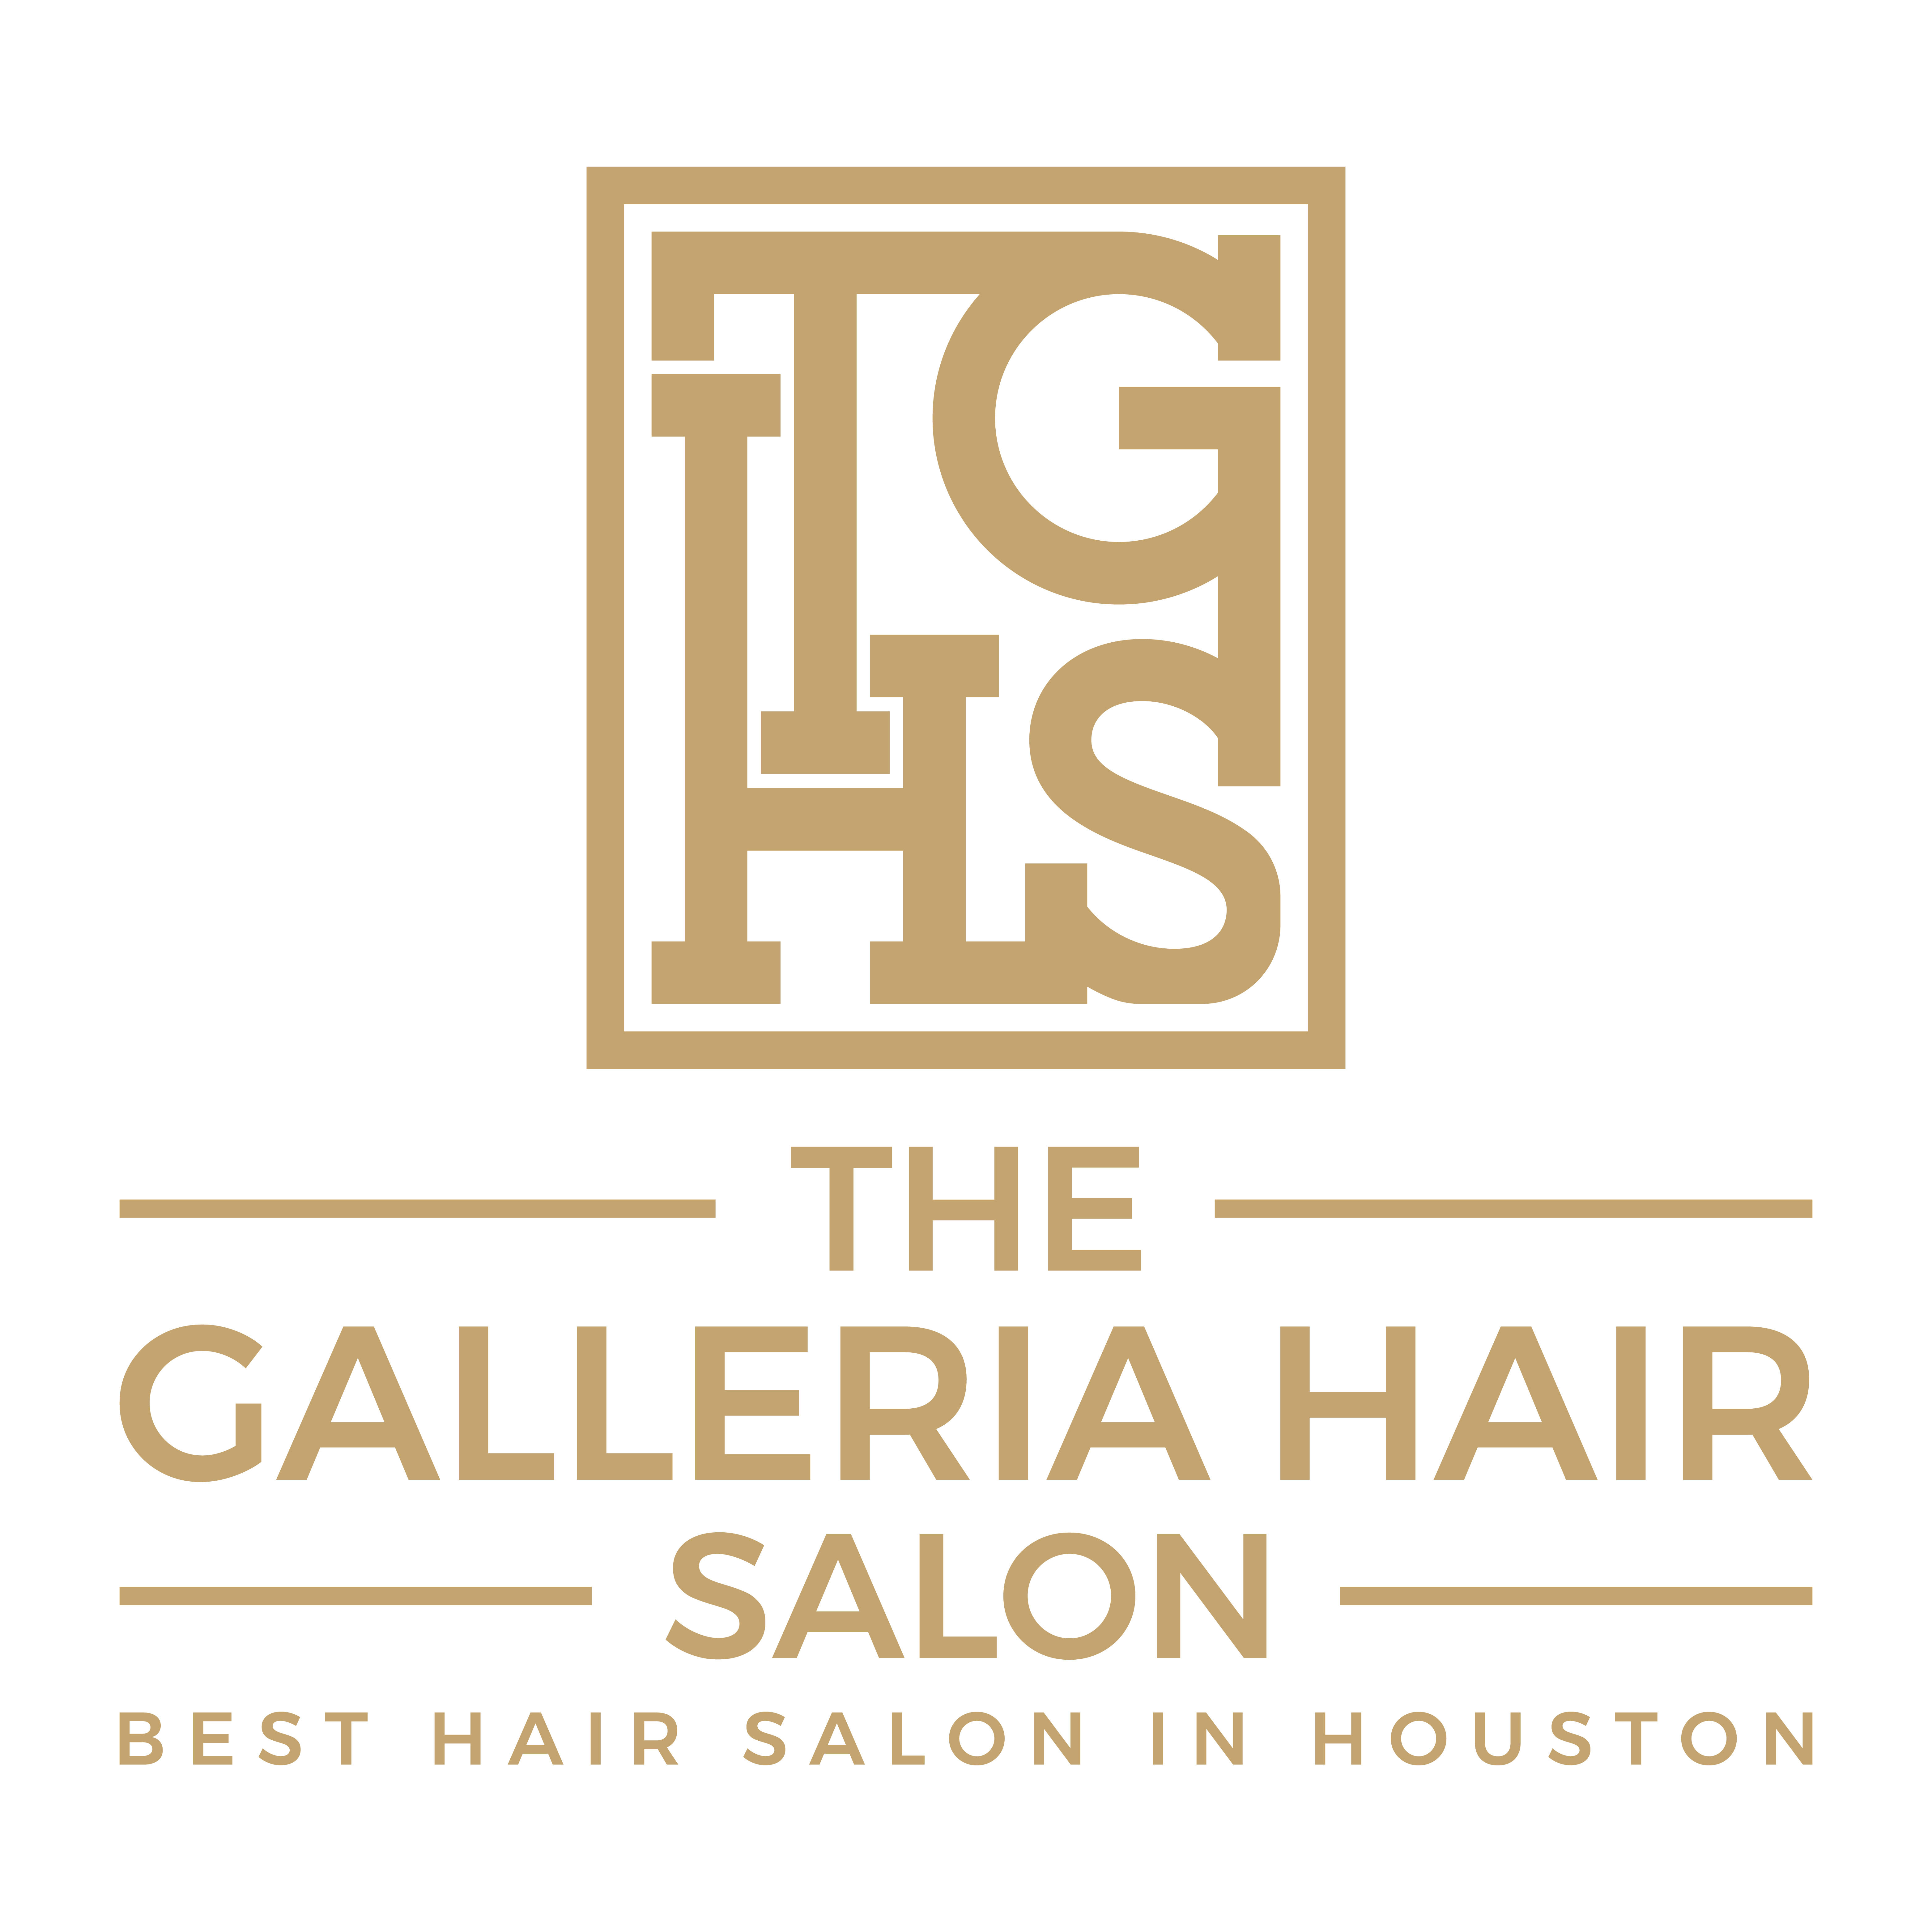 The Galleria Hair Salon - The Best Hair Salon in Houston!